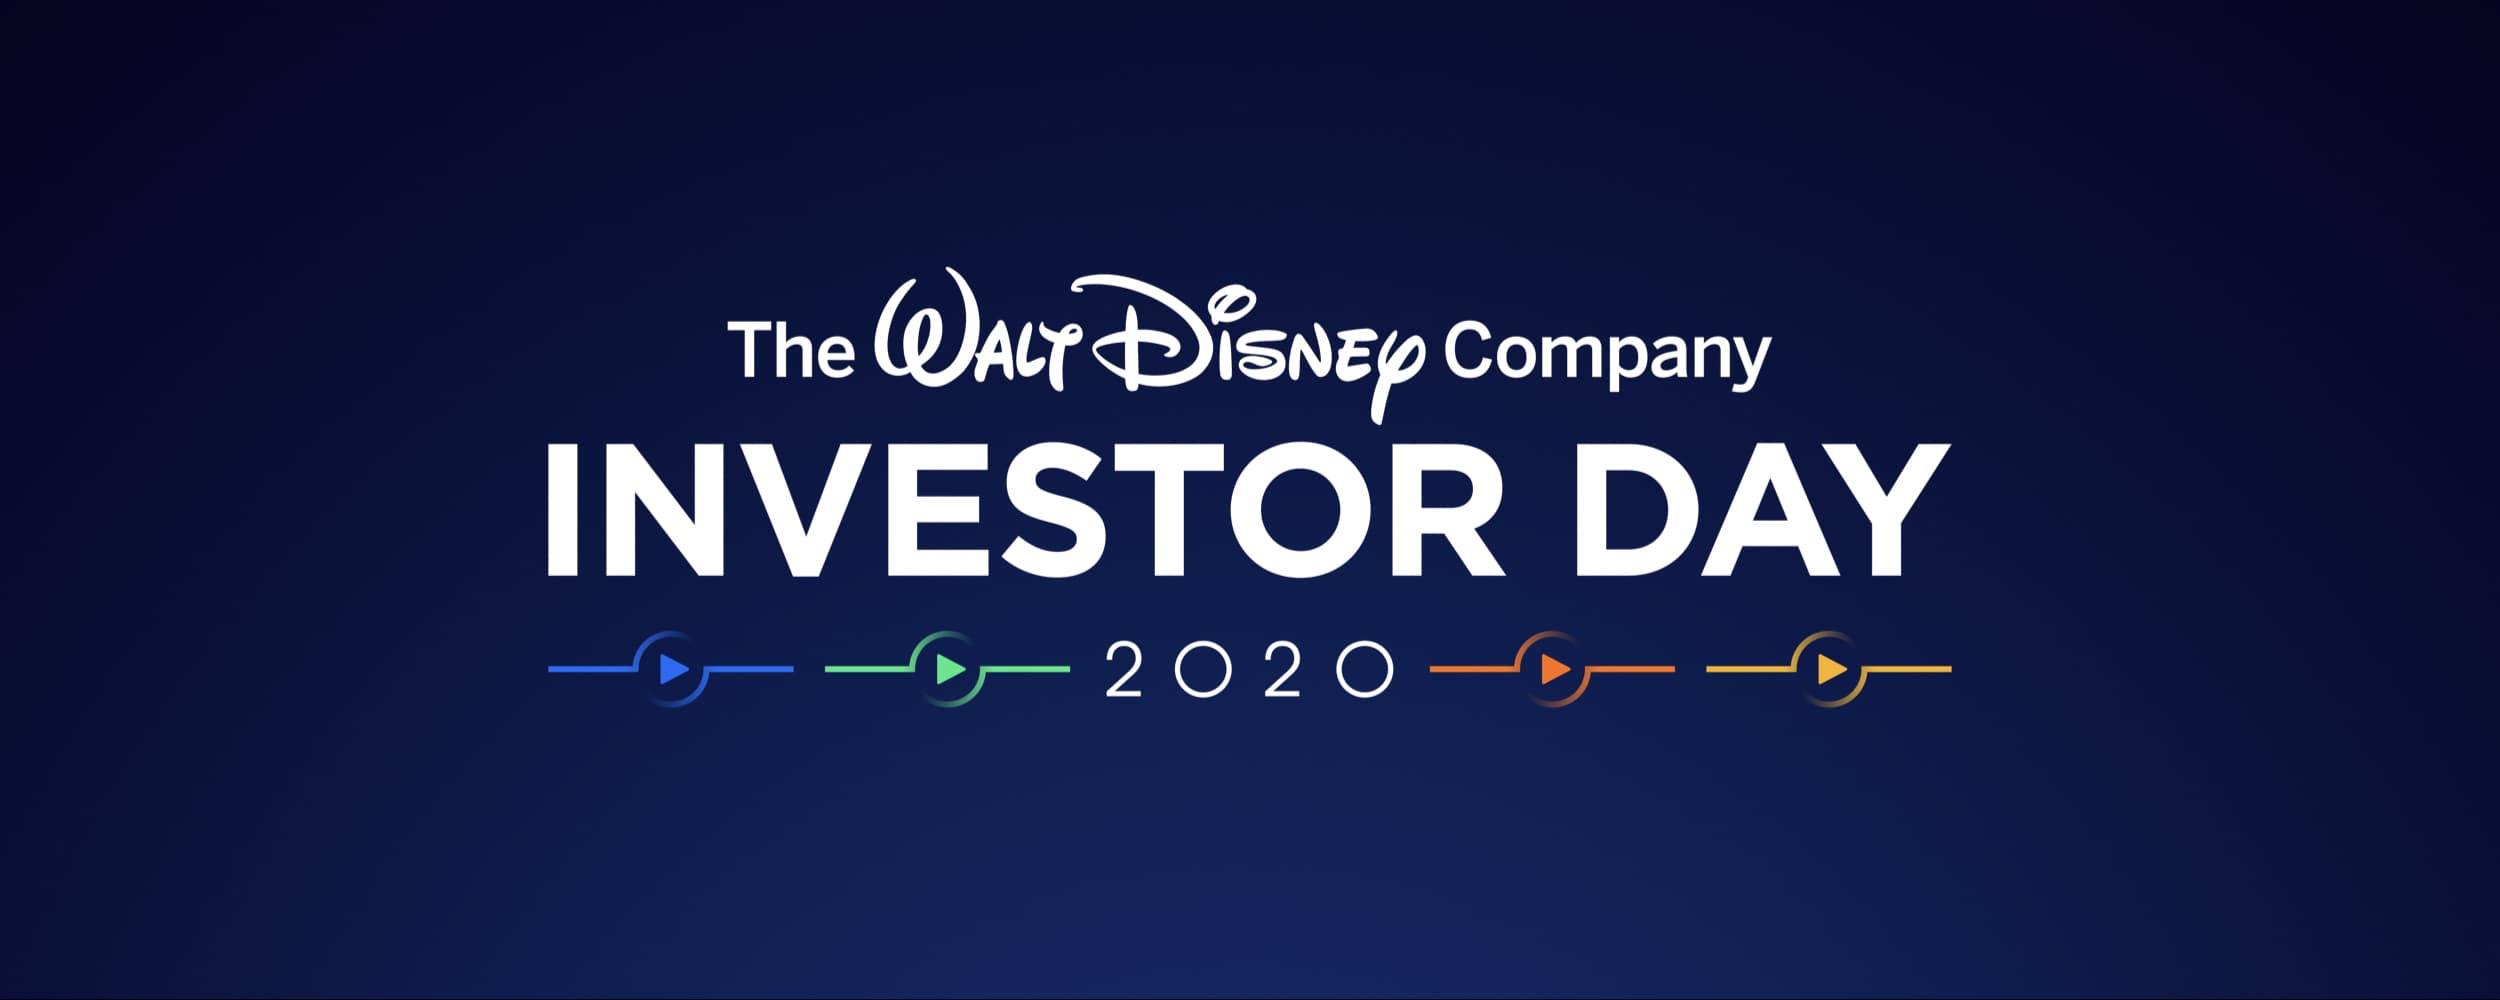 The Walt Disney Company Investor Day 2020